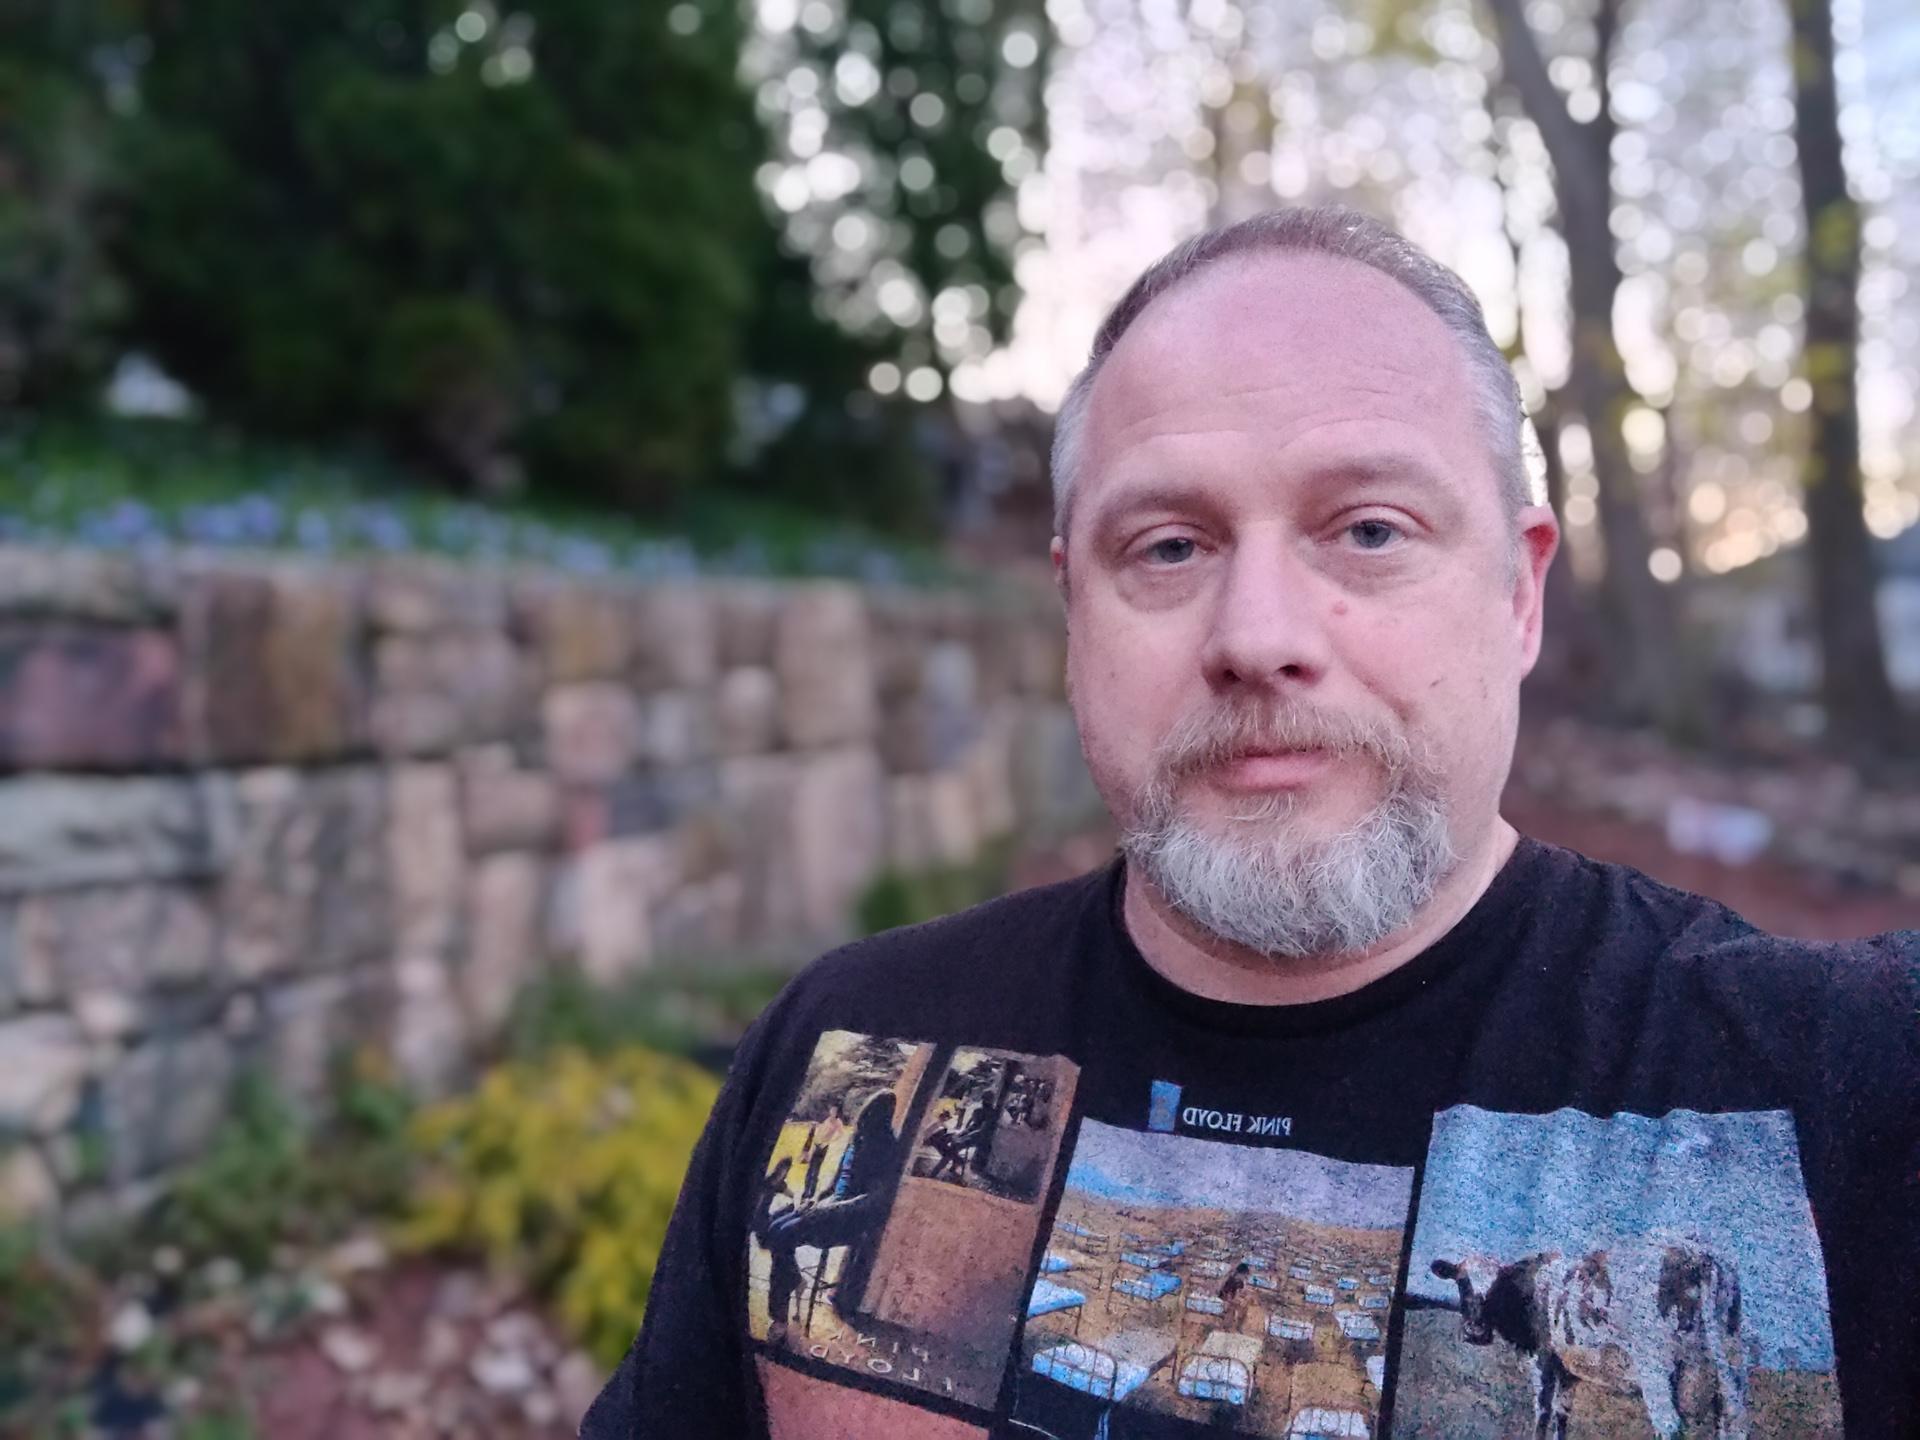 OnePlus 9 Pro photo sample self portrait